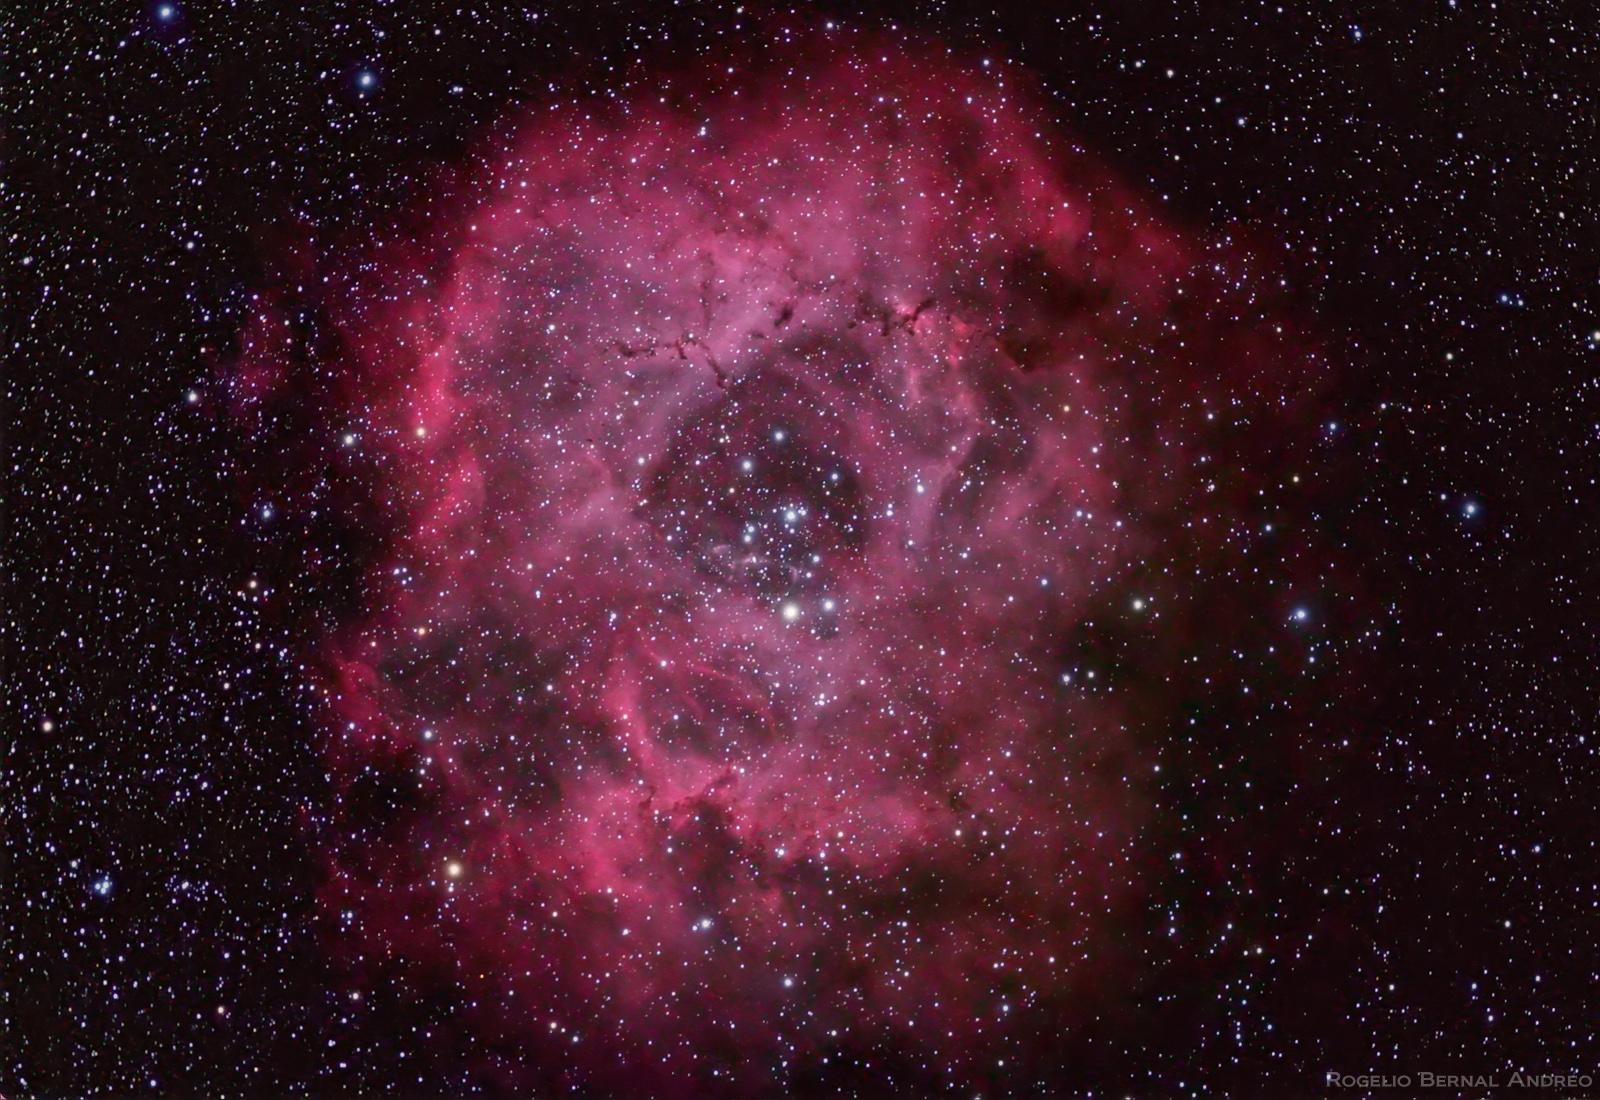 rosette nebula wallpaper - photo #25